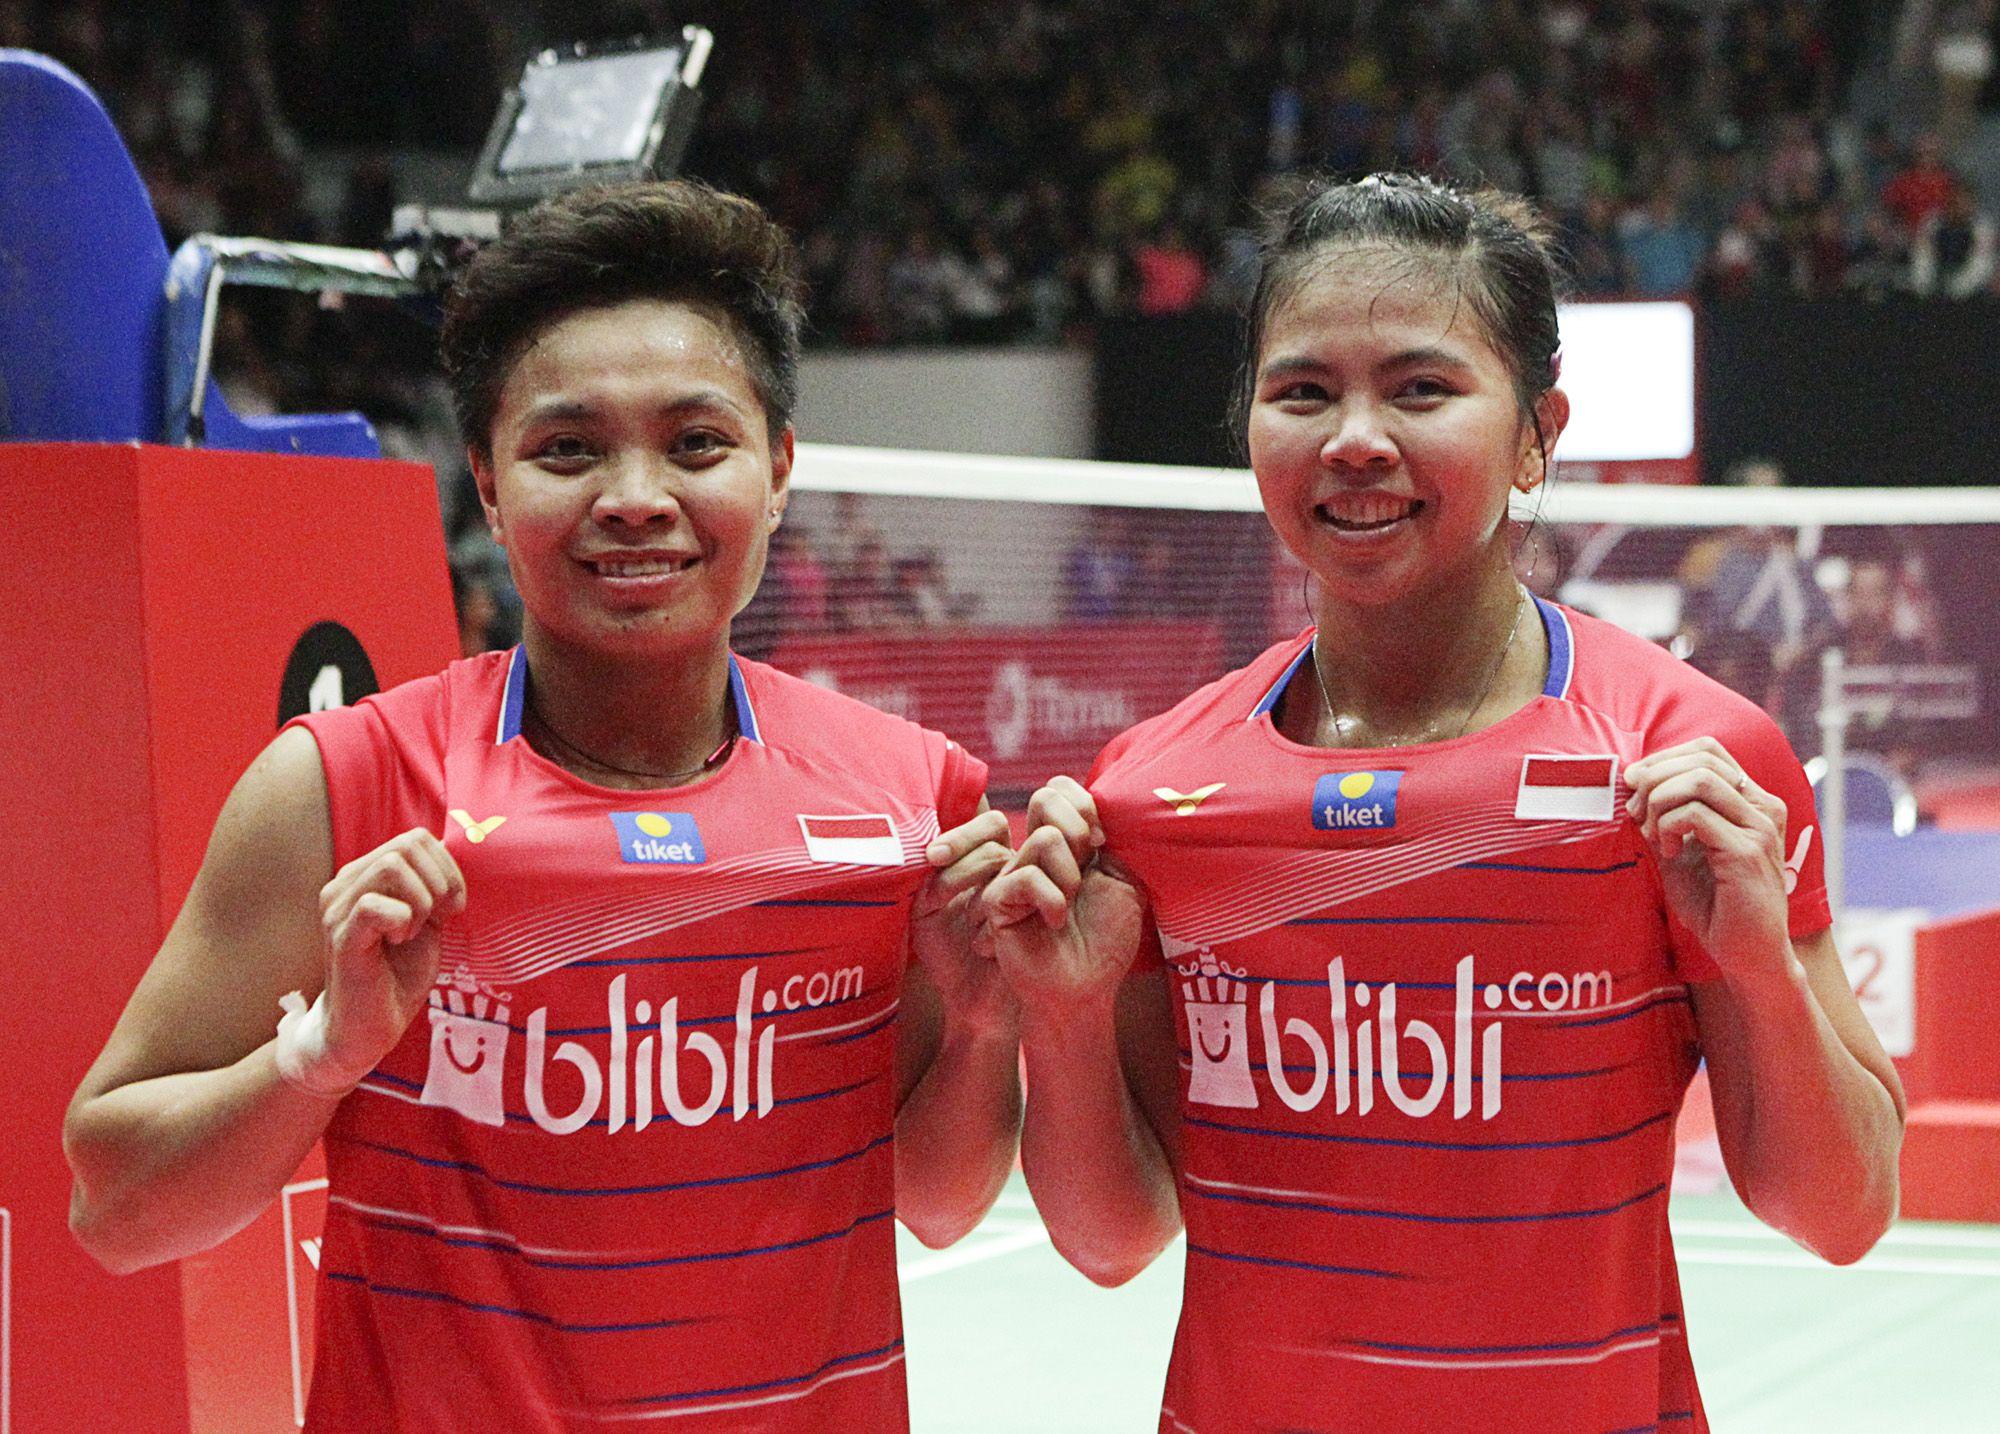 Greysia Polii (kanan) dan Apriyani Rahayu berpose di hadapan kamera usai memenangi final Indonesia Masters 2020 di Istora Senayan, Jakarta, 19 Januari 2020.